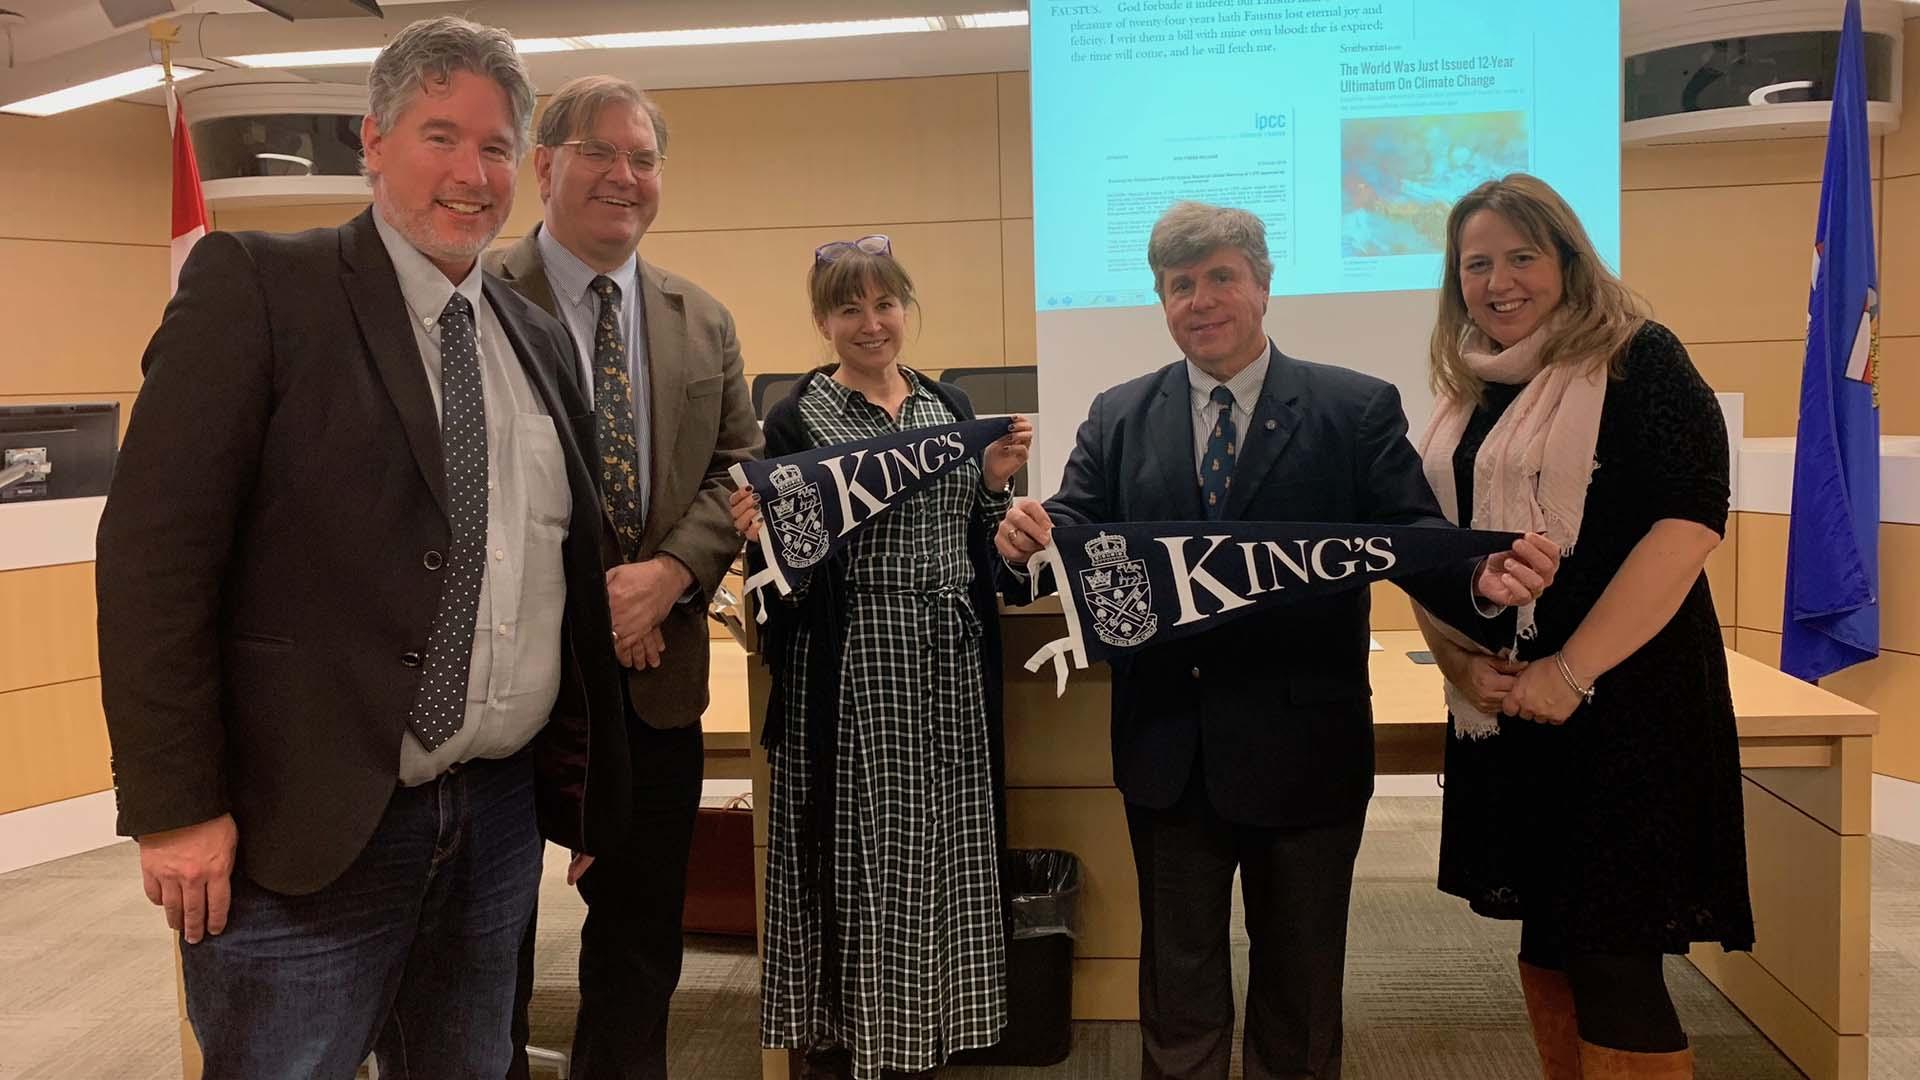 University of Calgary provisionally pre-admits King's Foundation